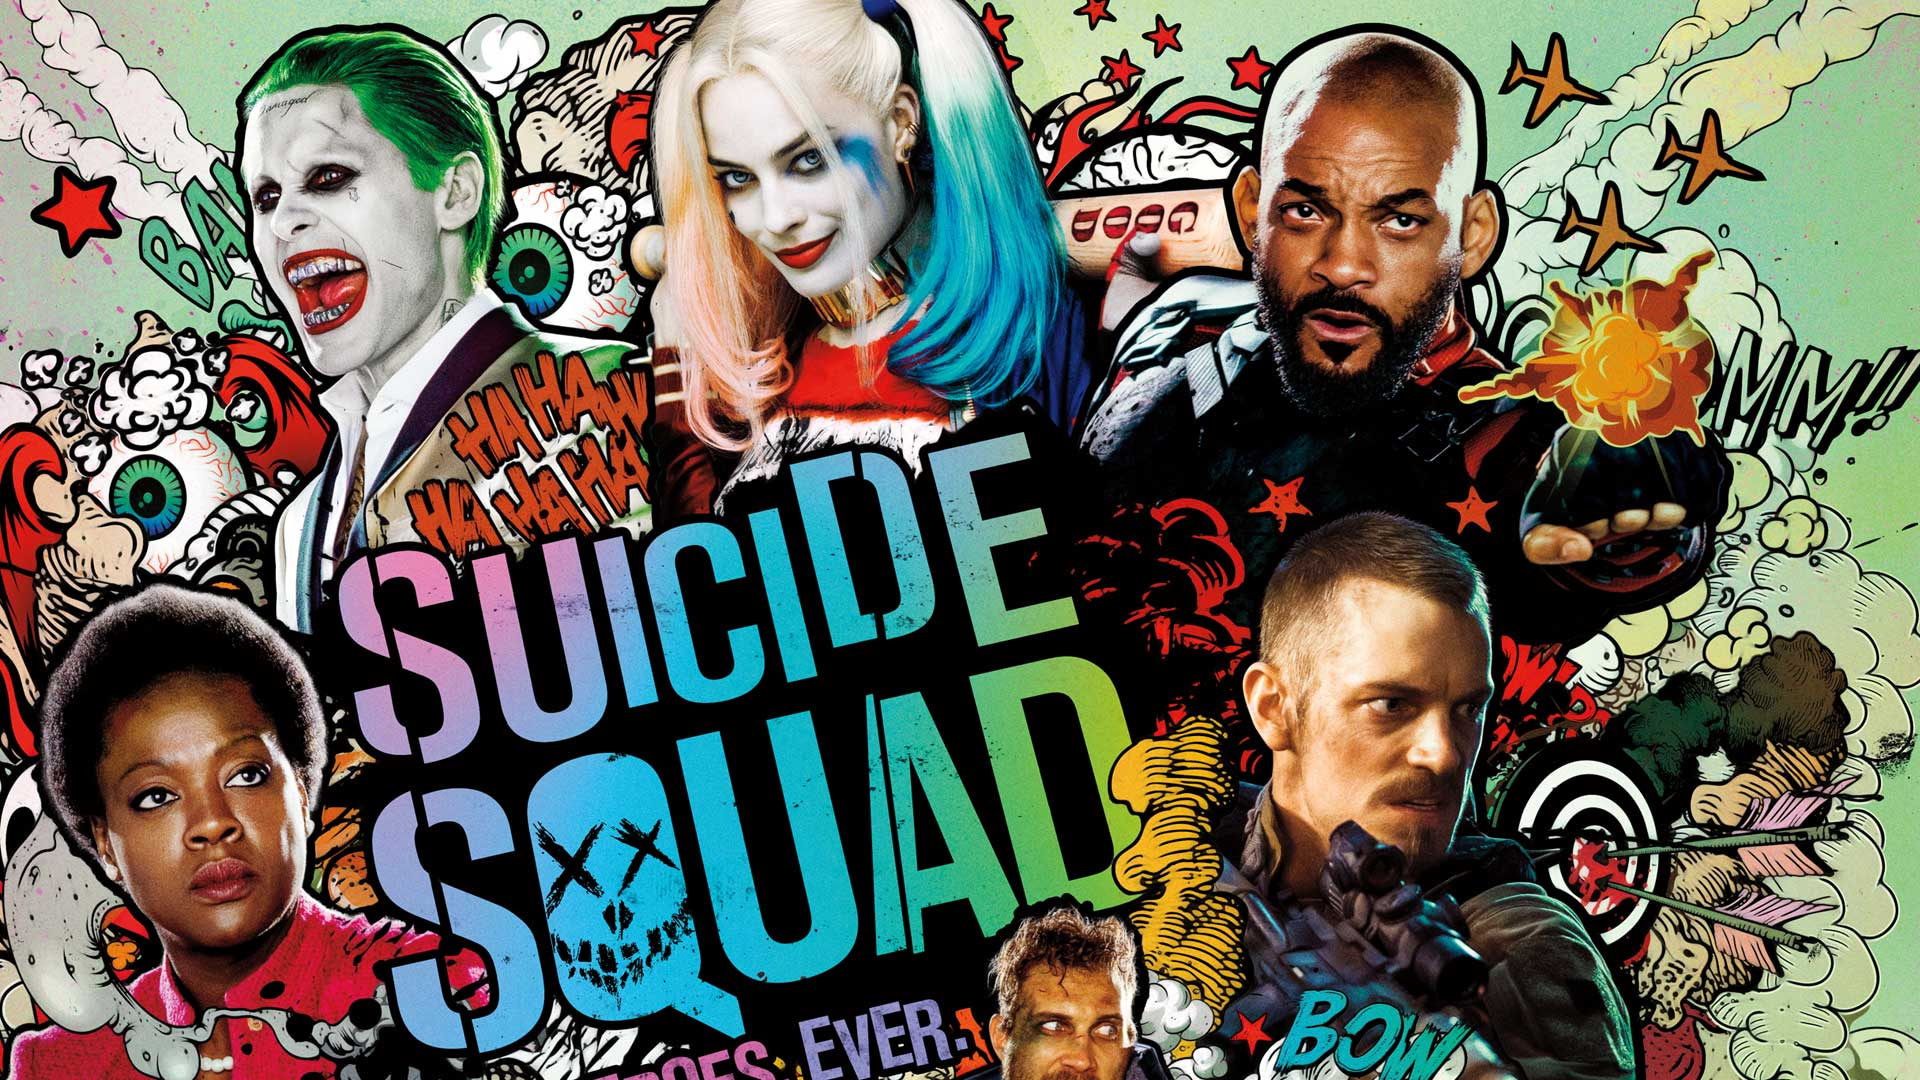 Suicide Squad BluRay - DC Comics News